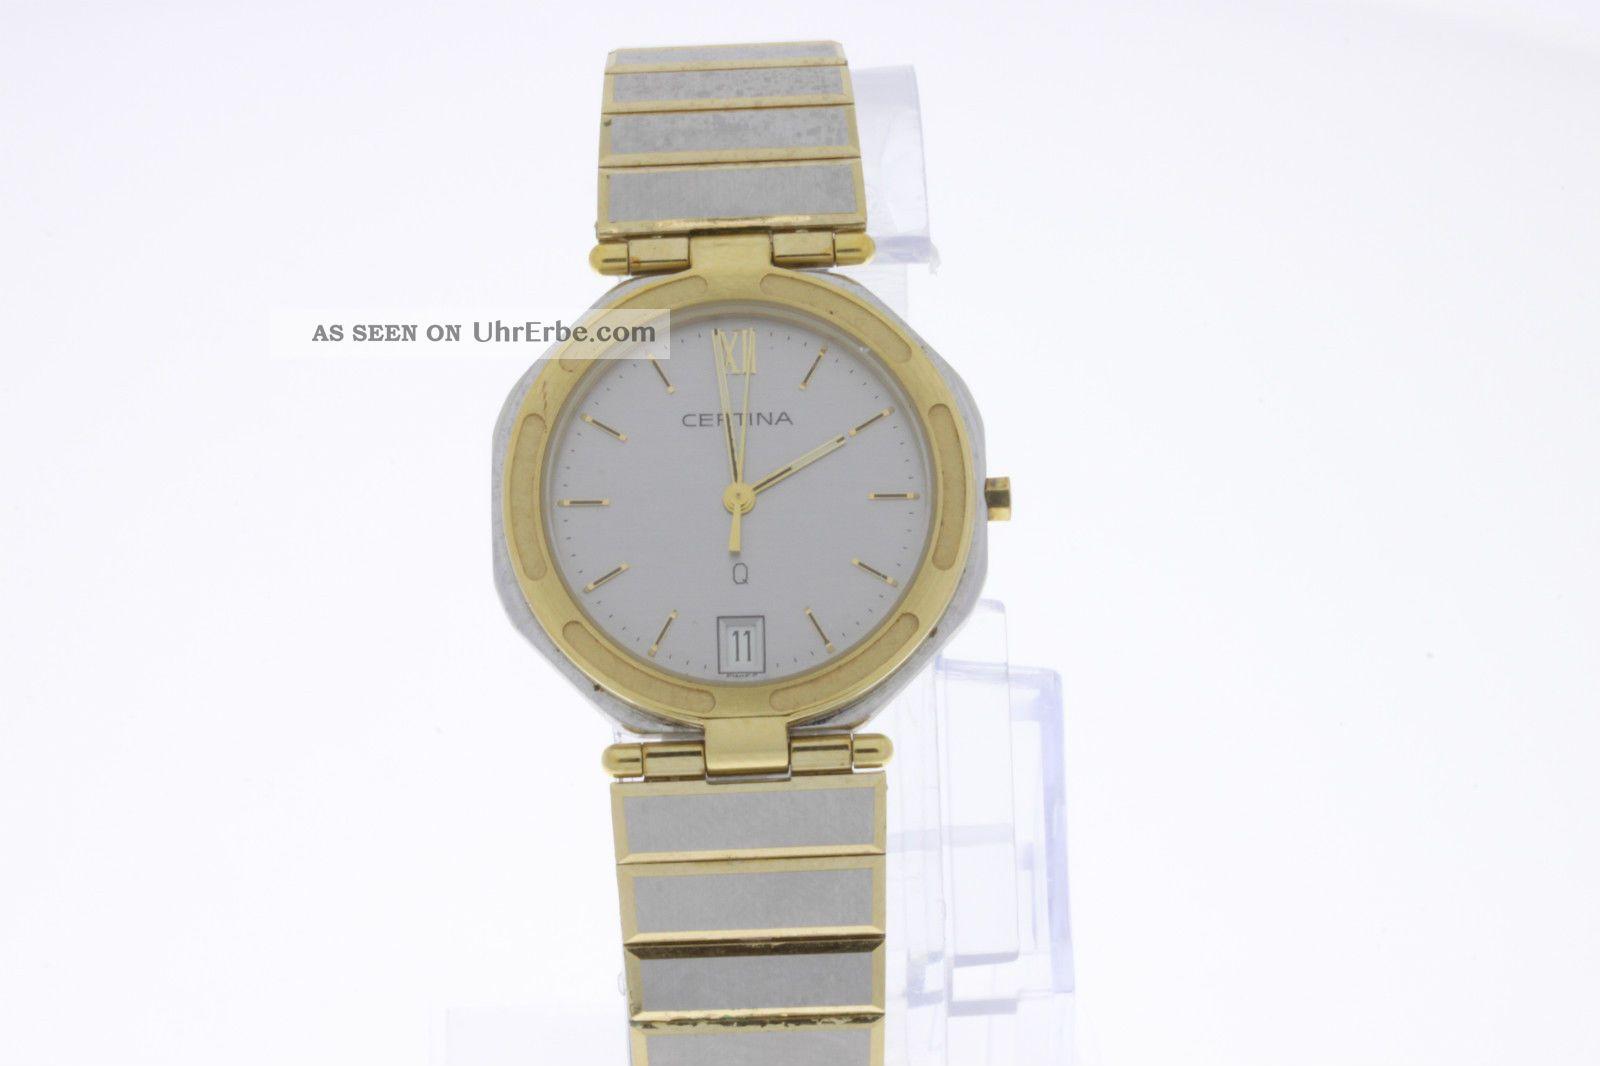 Certina Q Damenuhr Stahl/gold Quartz Armbanduhren Bild